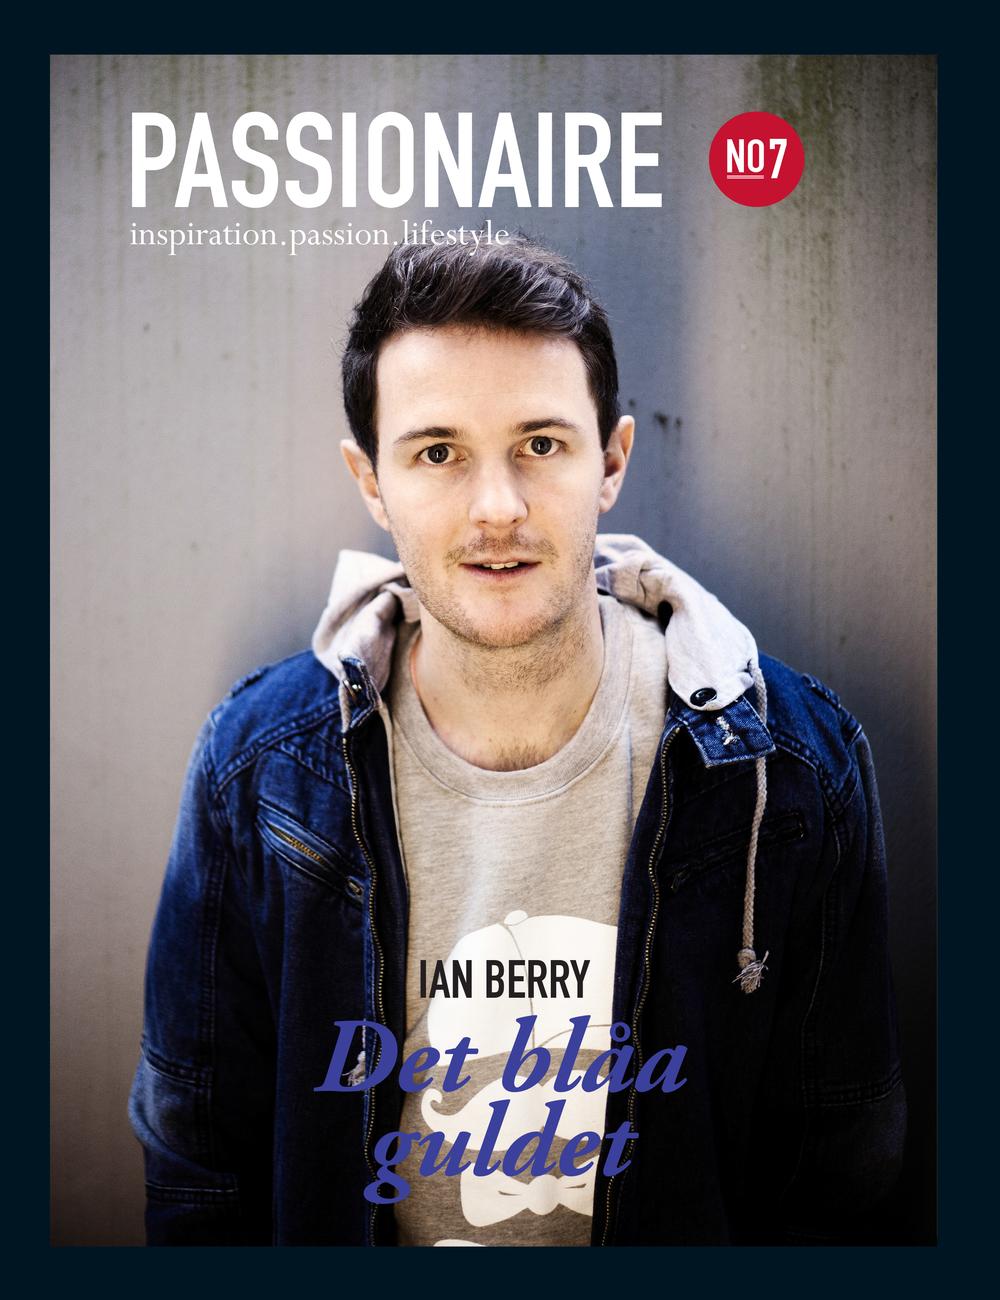 passionaire_ian_berry